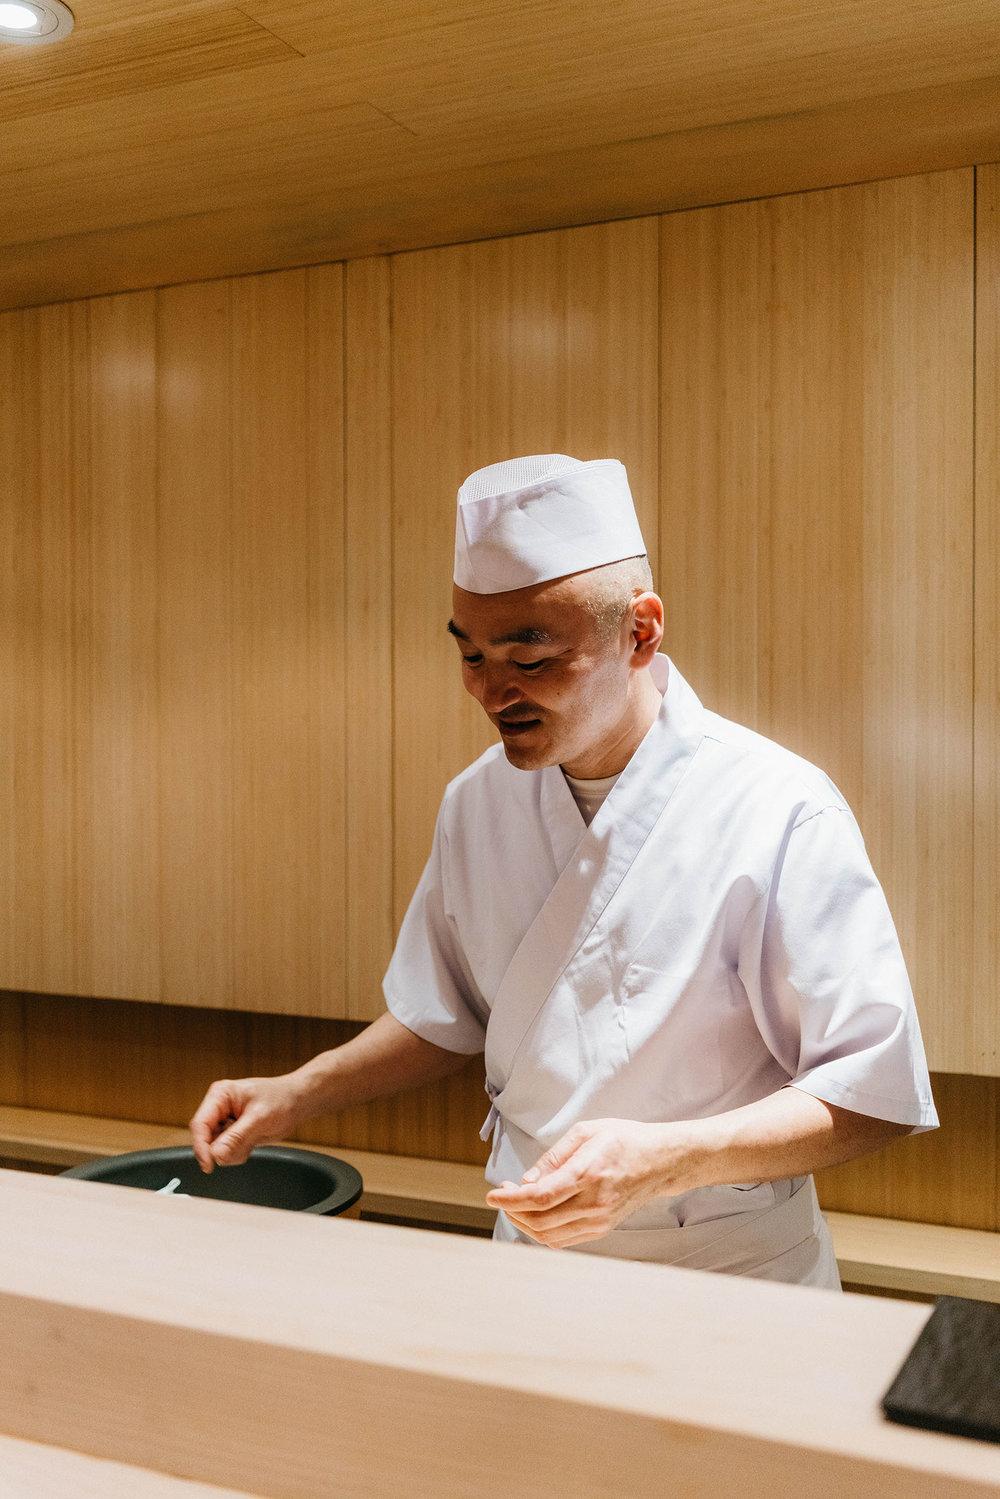 Chef Tatsuya Sekiguchi